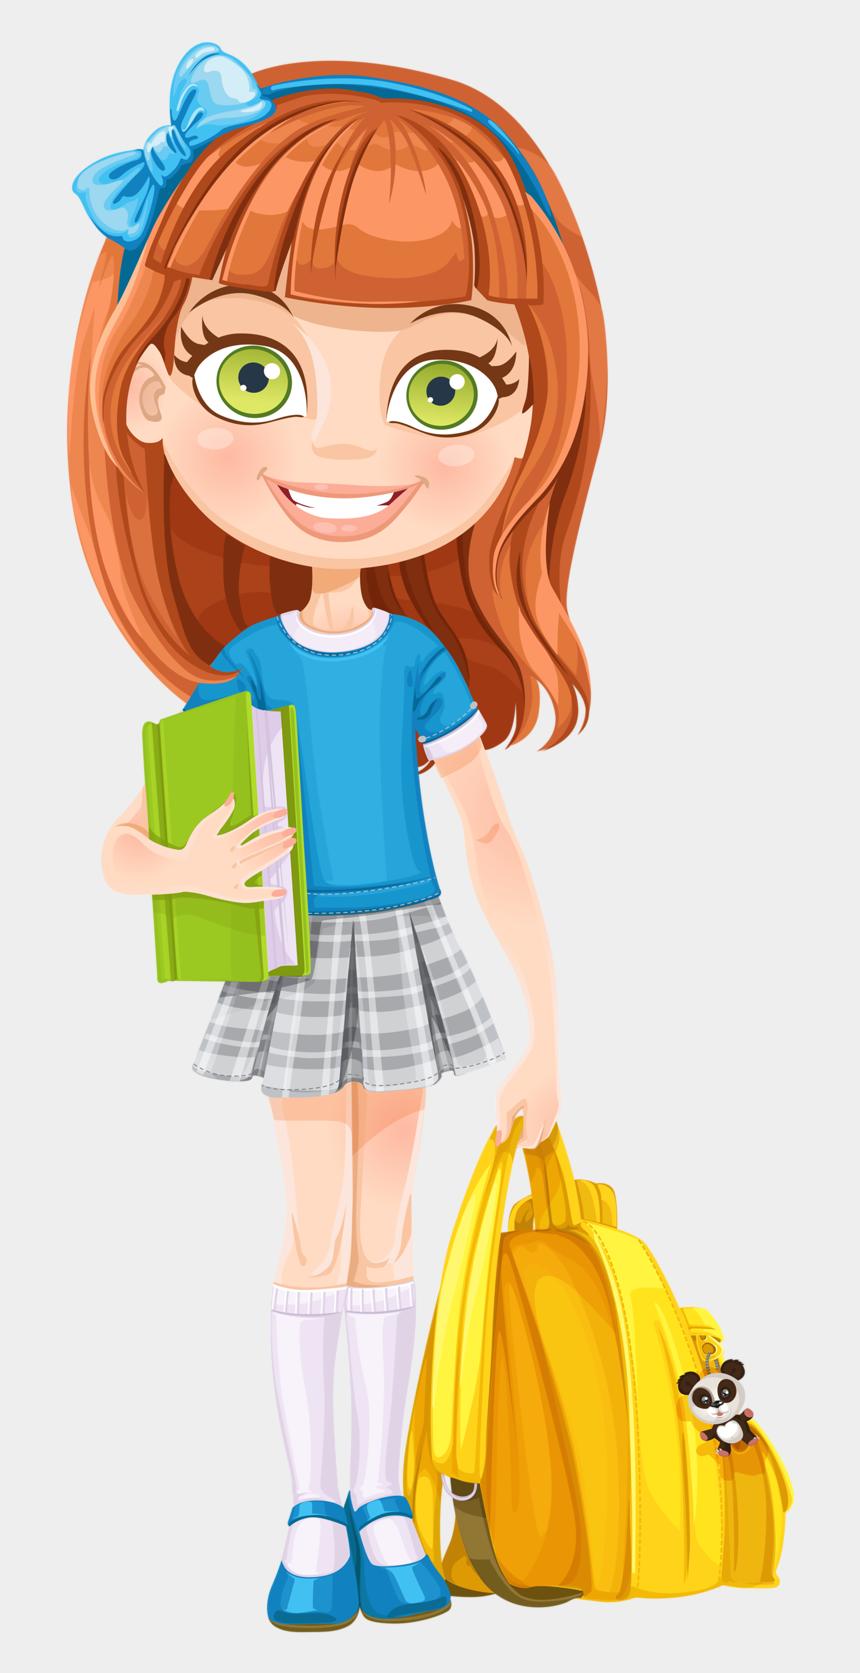 go to school clipart, Cartoons - Escola & Formatura Girl Clipart, Cute Clipart, Cartoon - School Girl Clipart Transparent